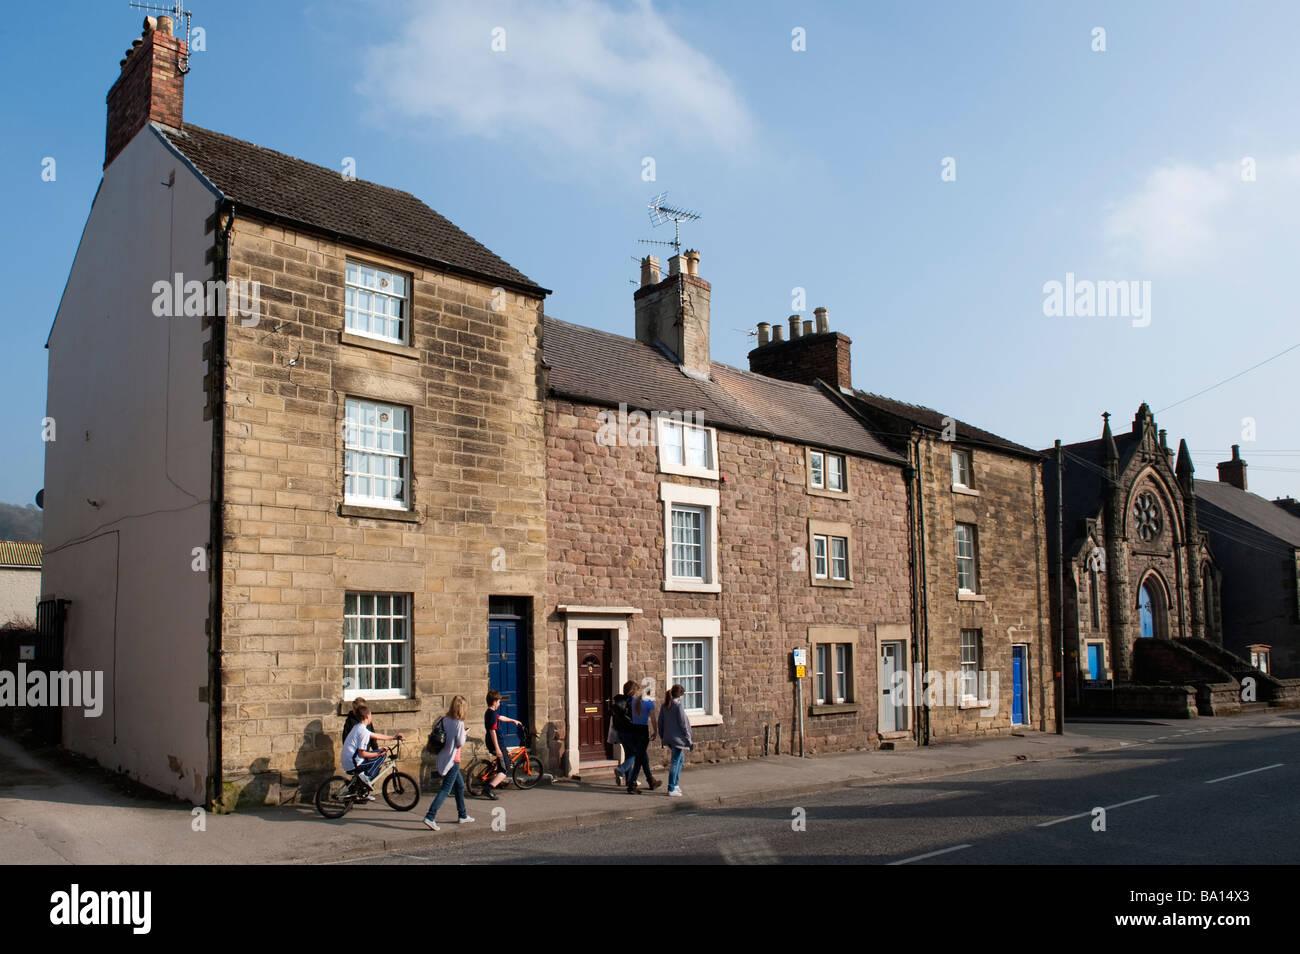 'St Johns Street' in Wirksworth,Derbyshire,  England, 'Great Britain', 'United Kingdom' - Stock Image